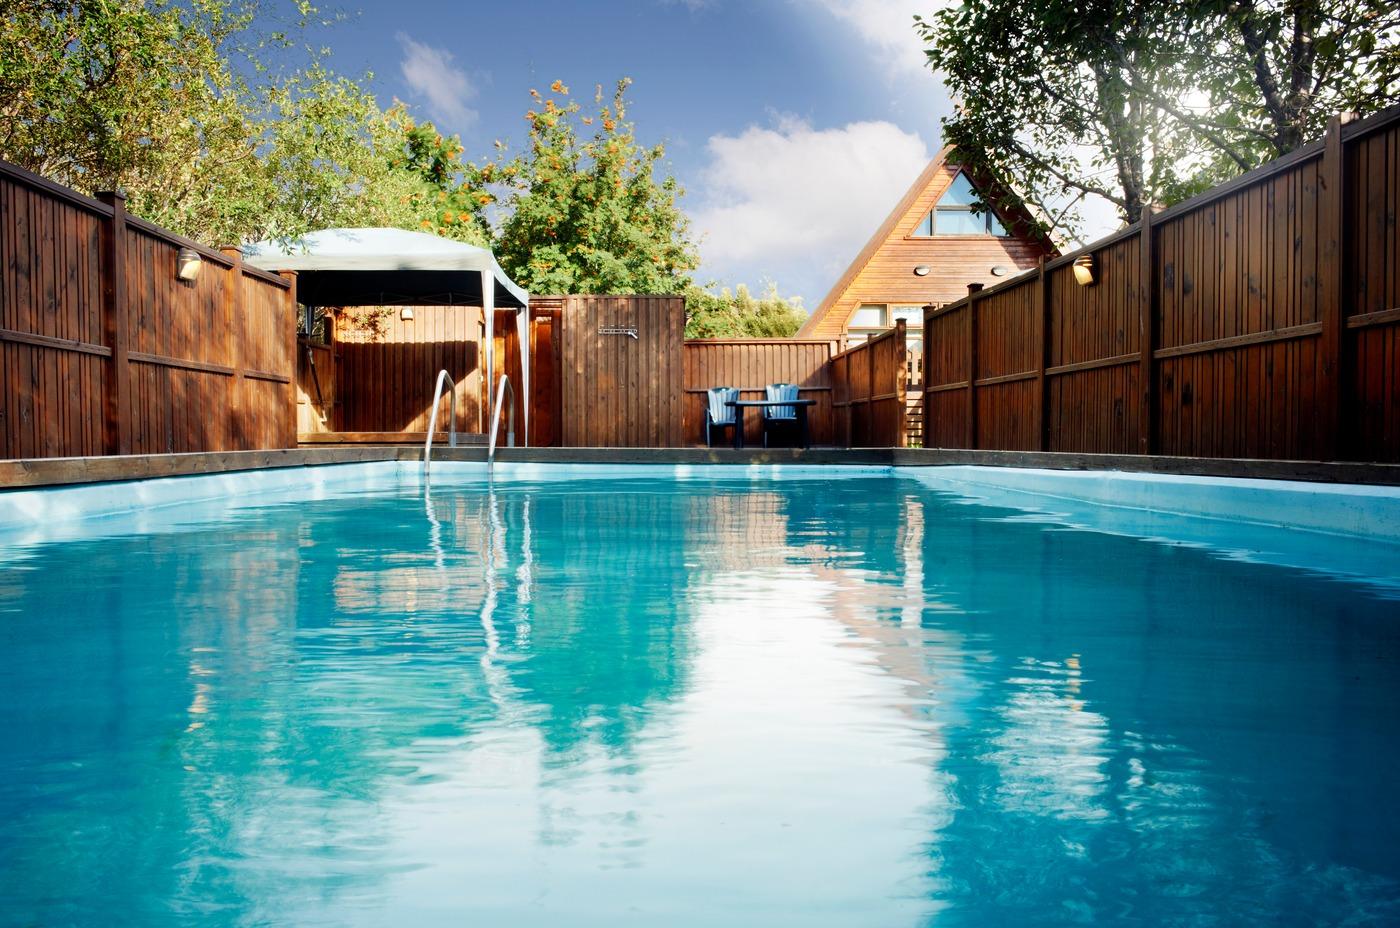 Birkihof Lodge has its own outdoor pool.